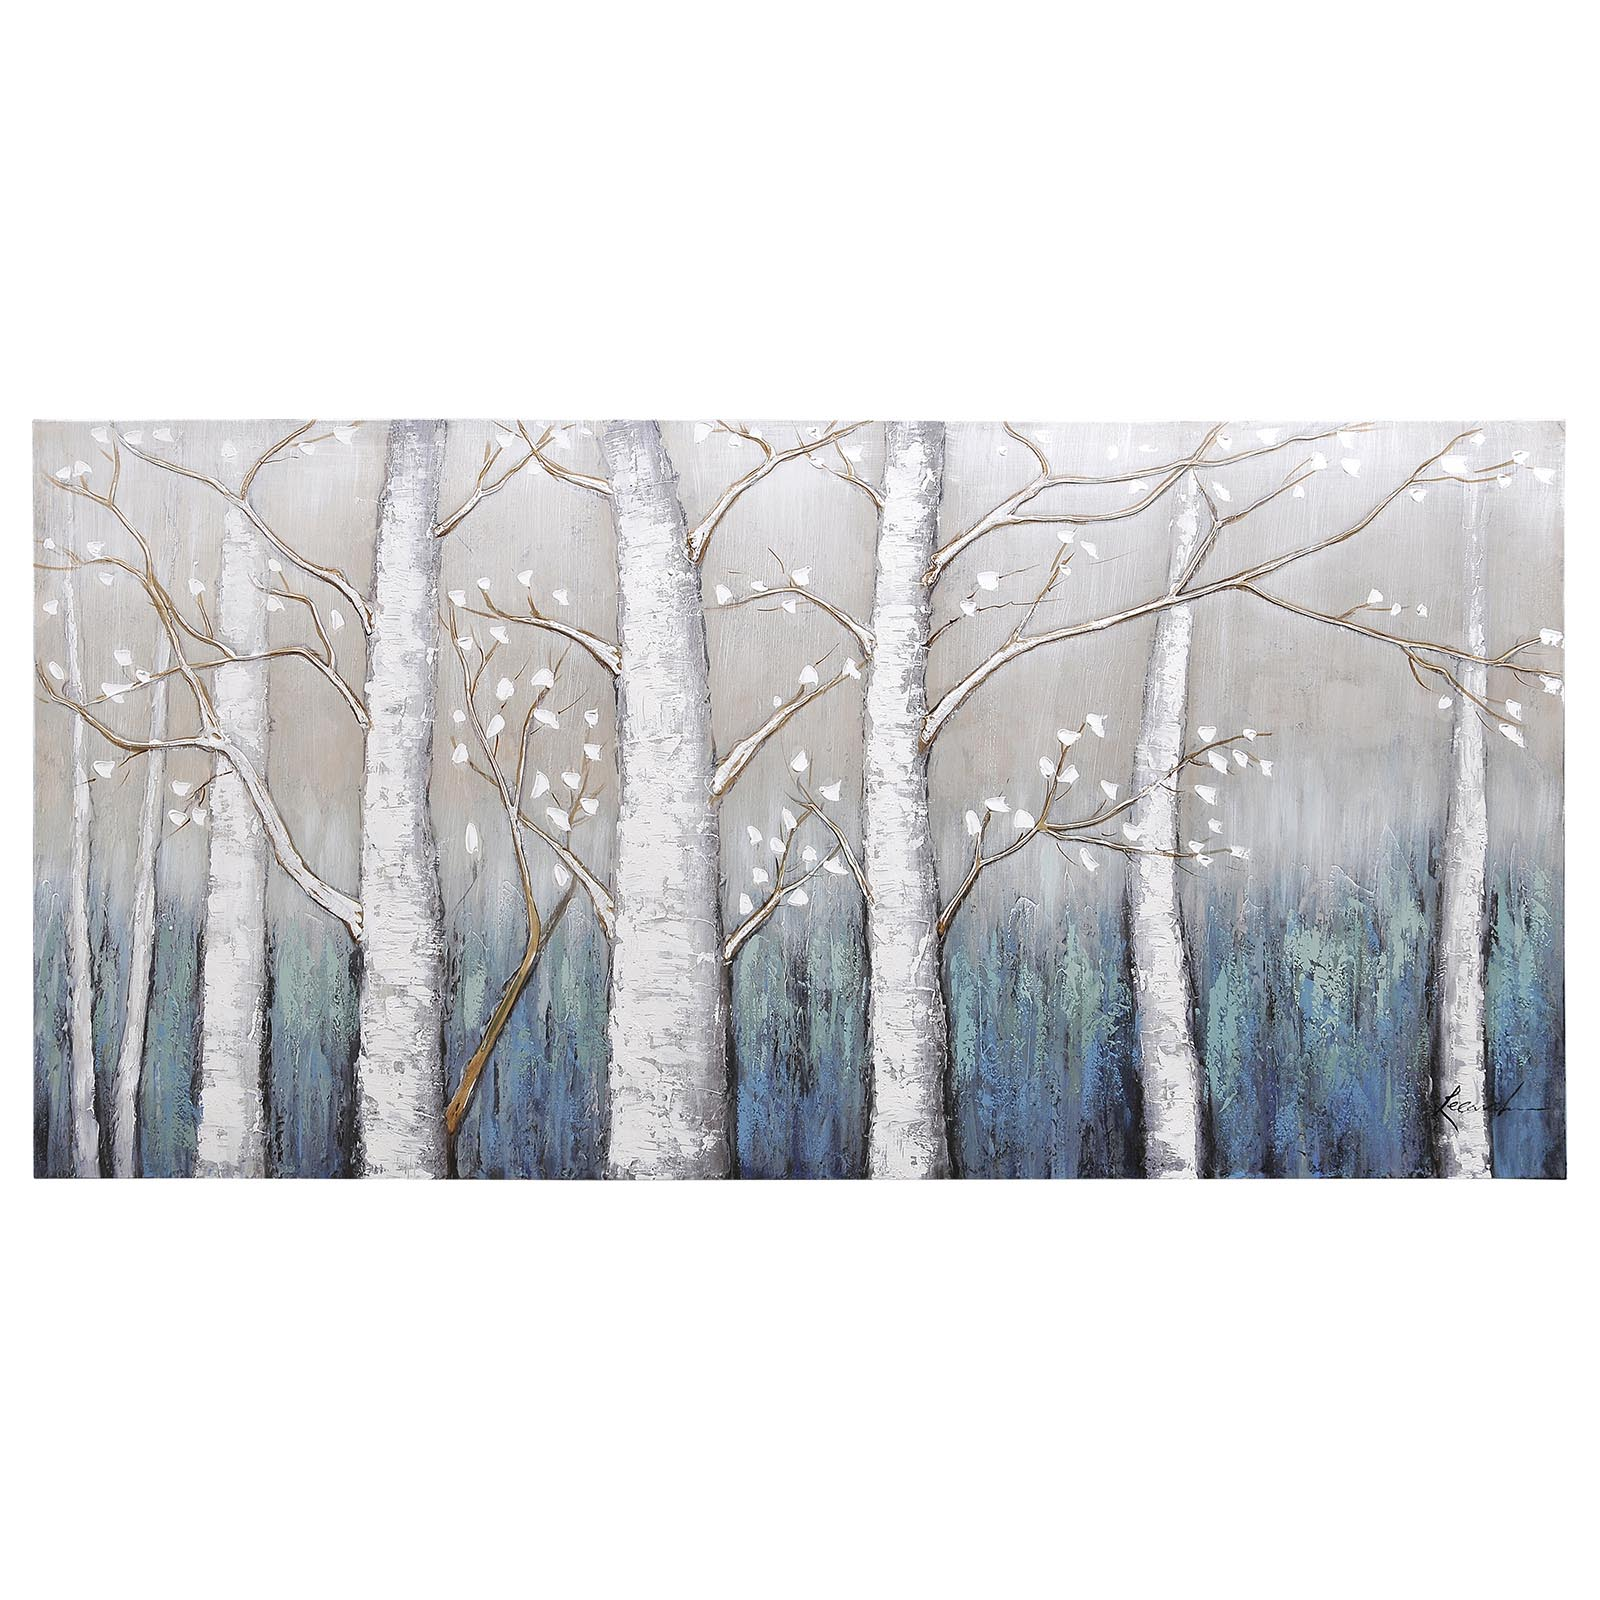 Echoes Rectangular Painting OL895